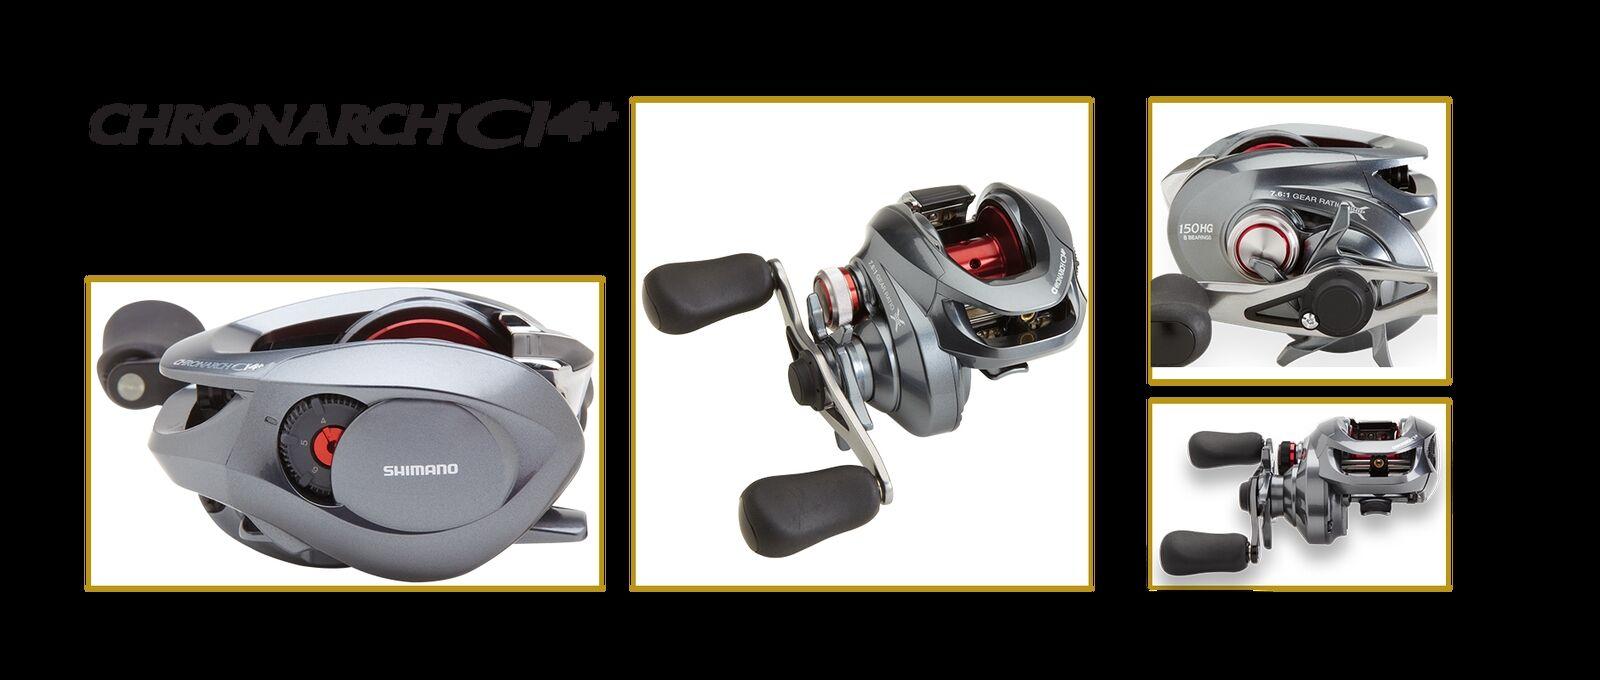 SHIMANO CHRONARCH C14151 BAITCASTER FISHING REEL  LH   shopping online di moda